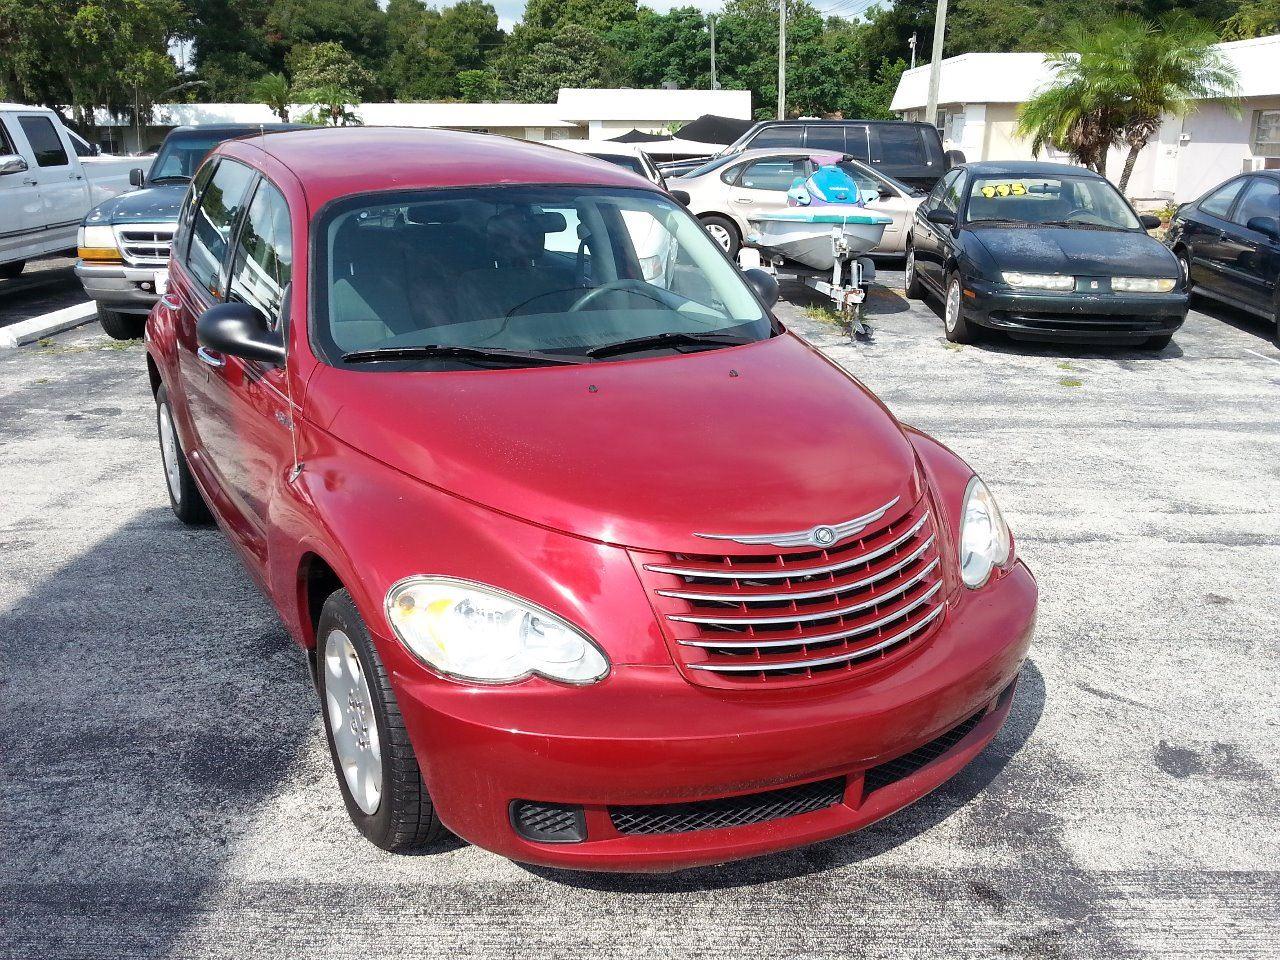 2006 Chrysler PT Cruiser for sale at D & D Detail Experts / Cars R Us in New Smyrna Beach FL